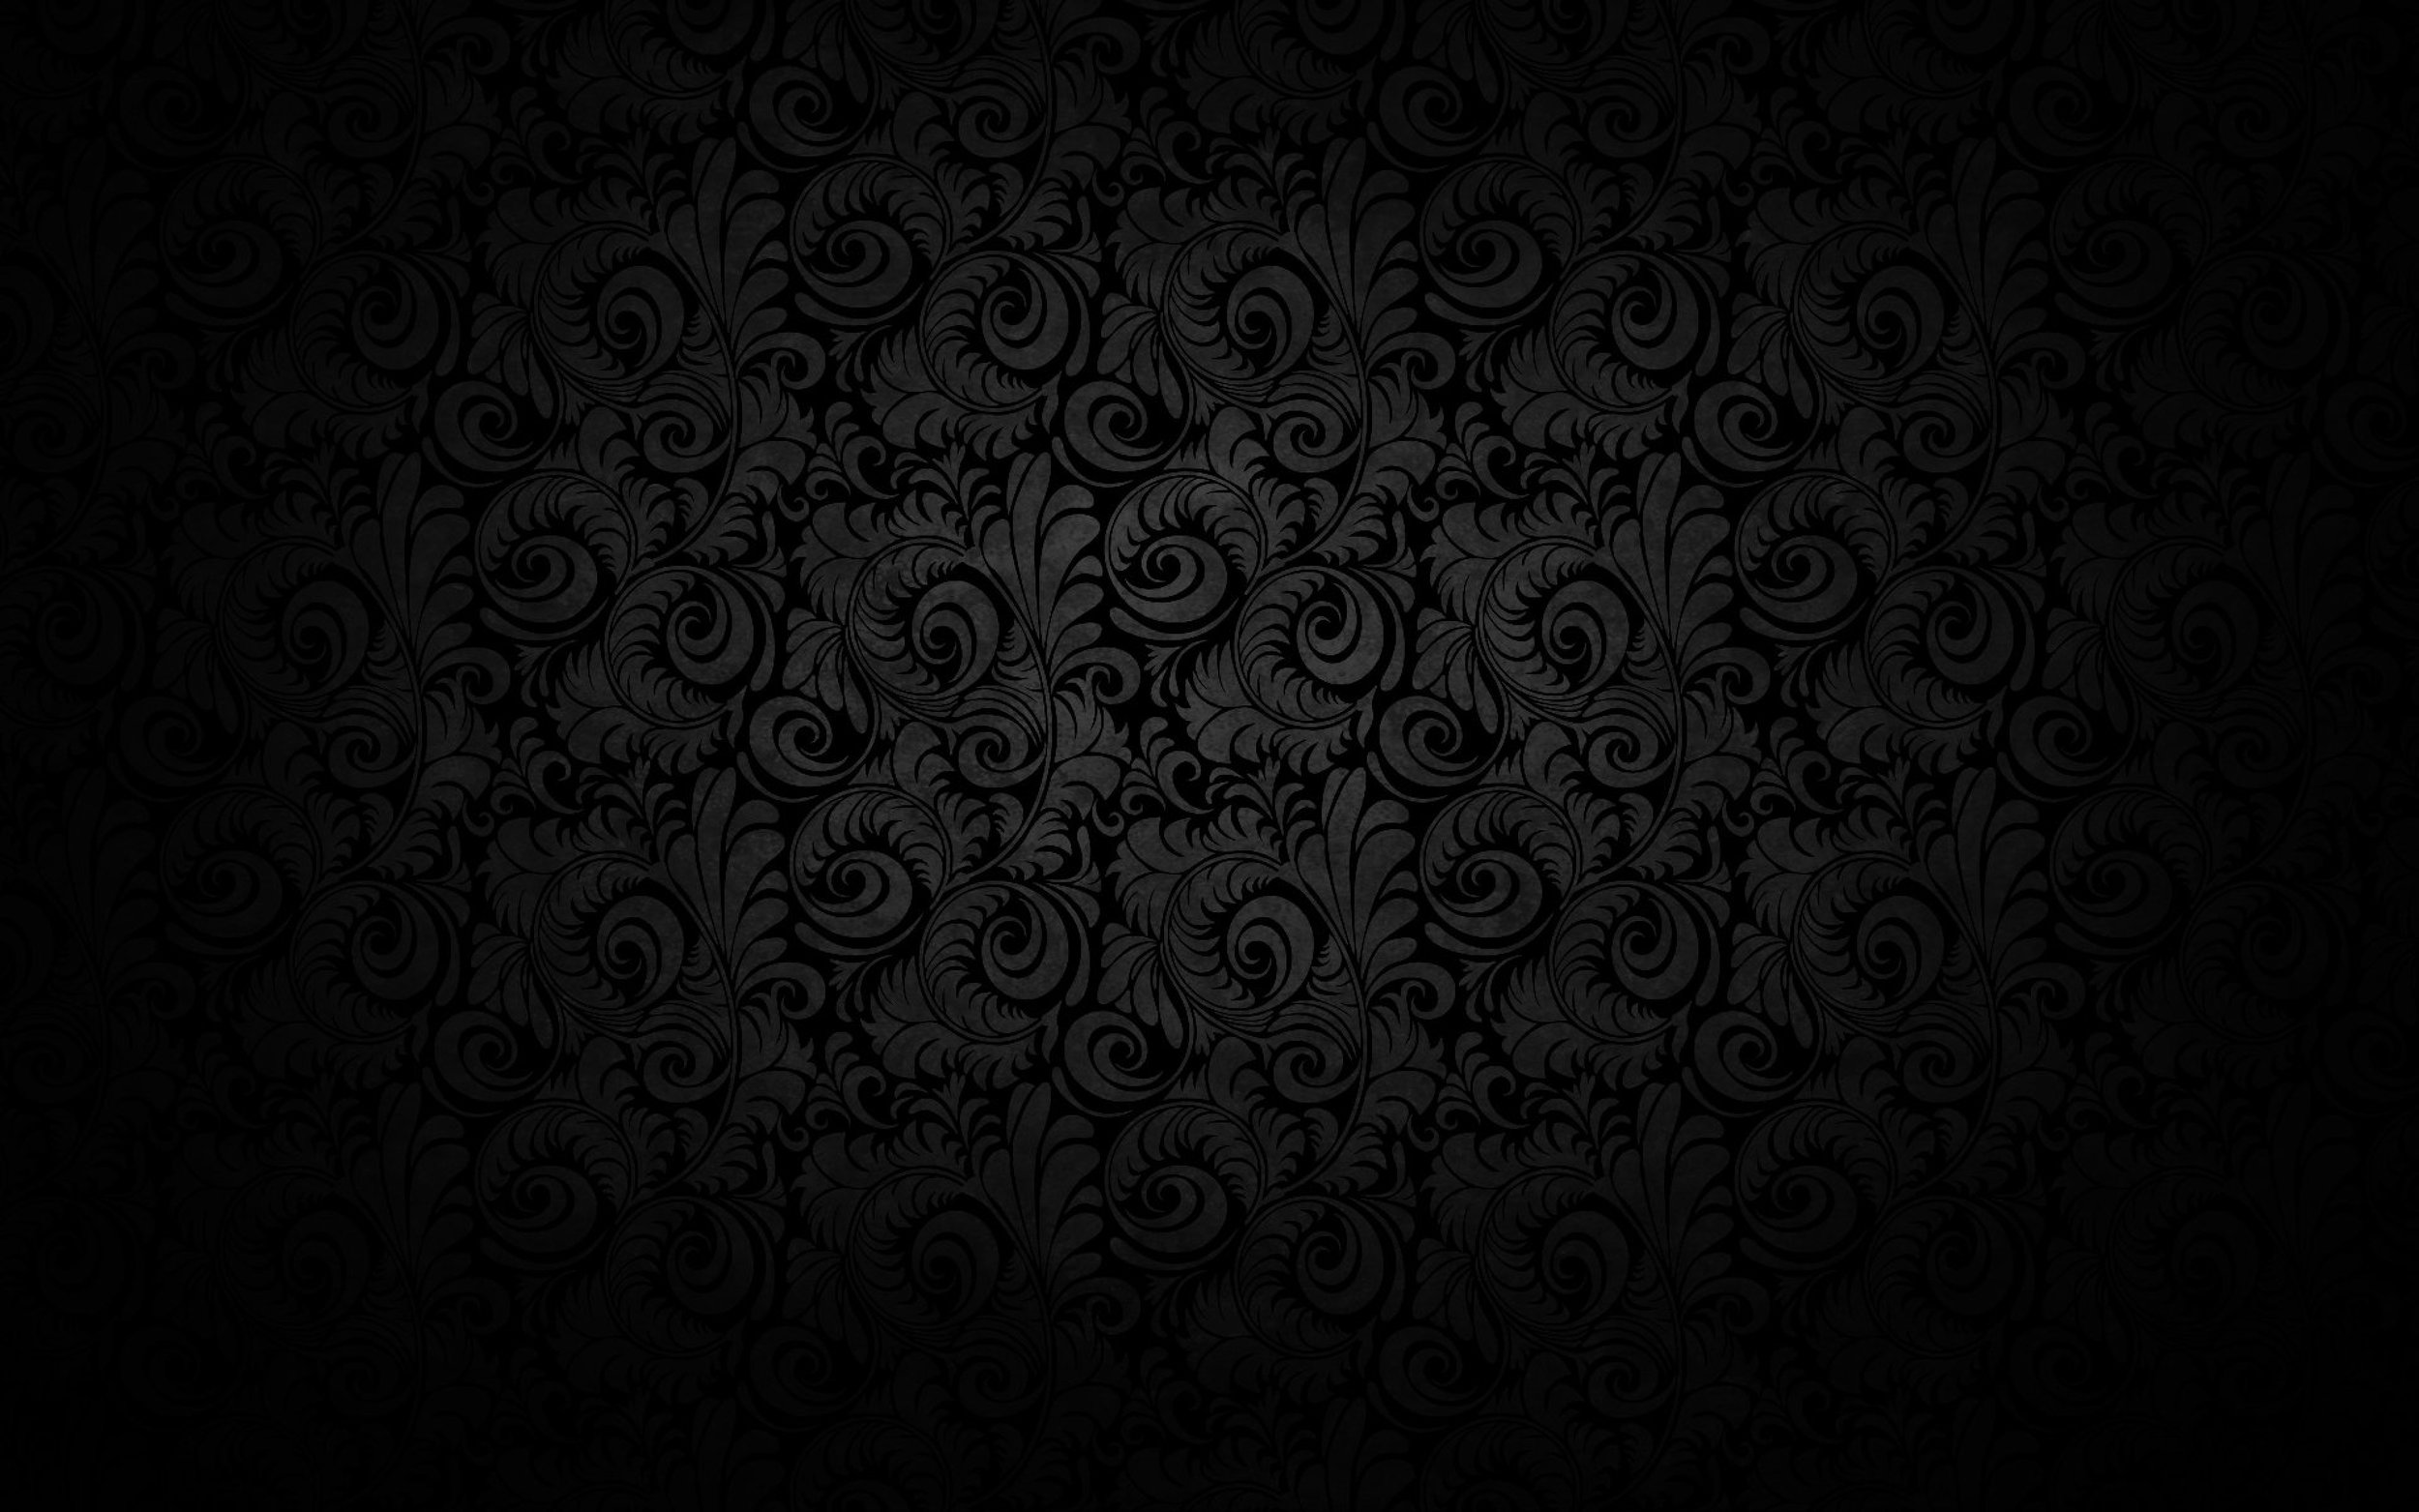 black_background_pattern_light_texture_55291_3840x2400.jpg